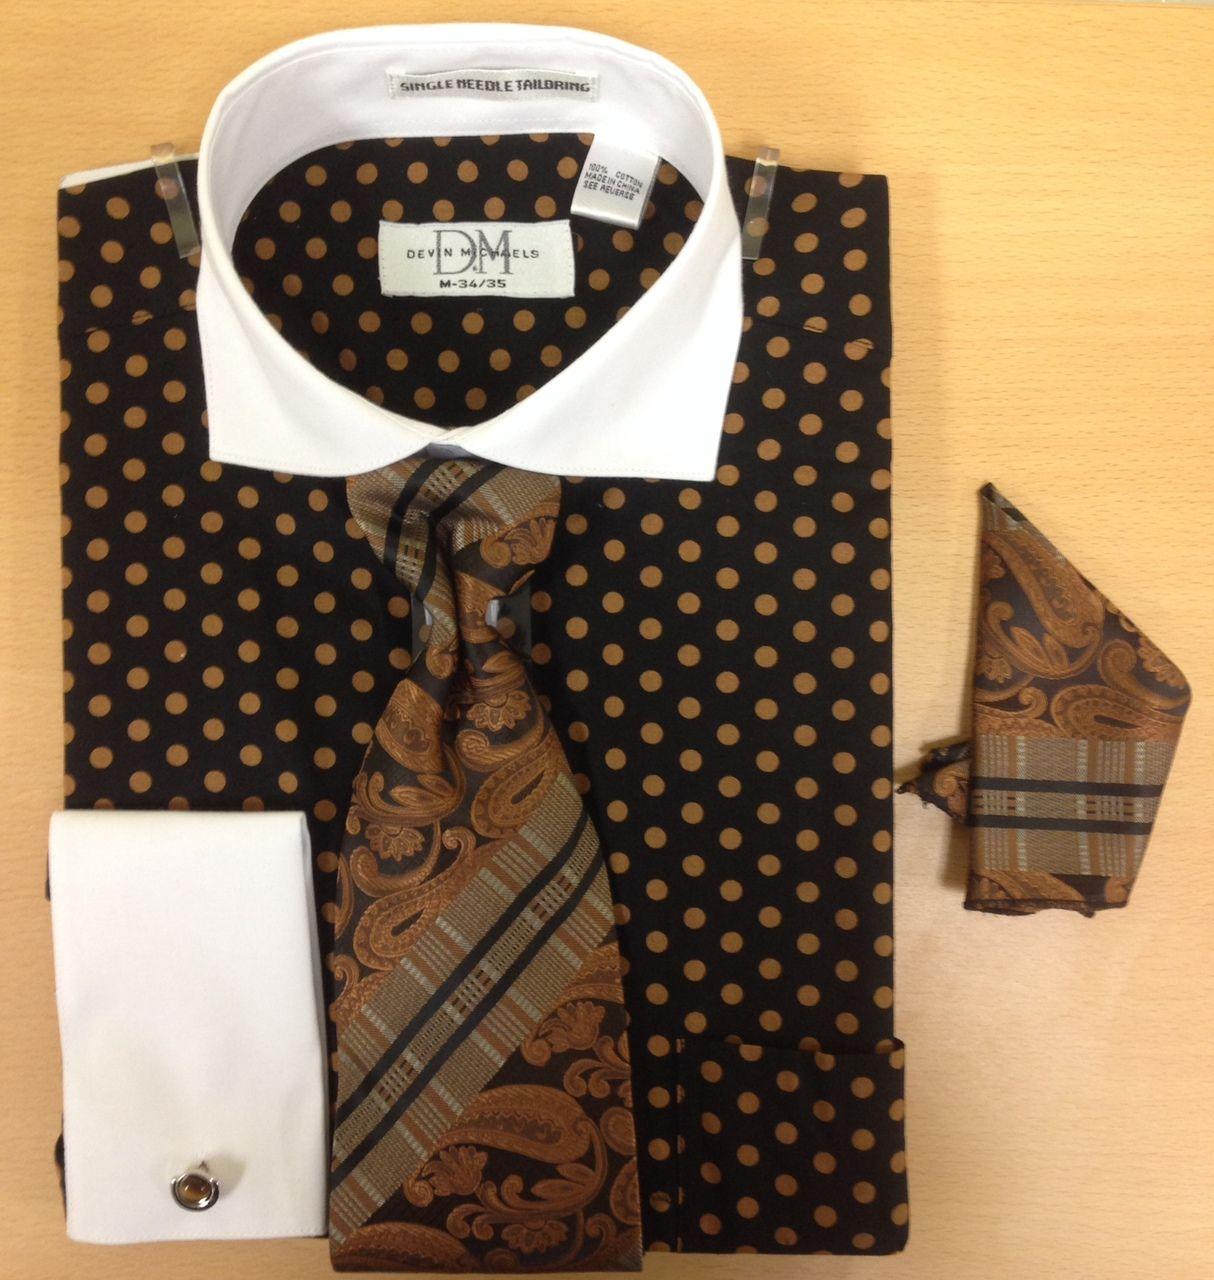 Men's Fashion Polka Dot Pattern Cufflink Dress Shirt Set - Black and Brown